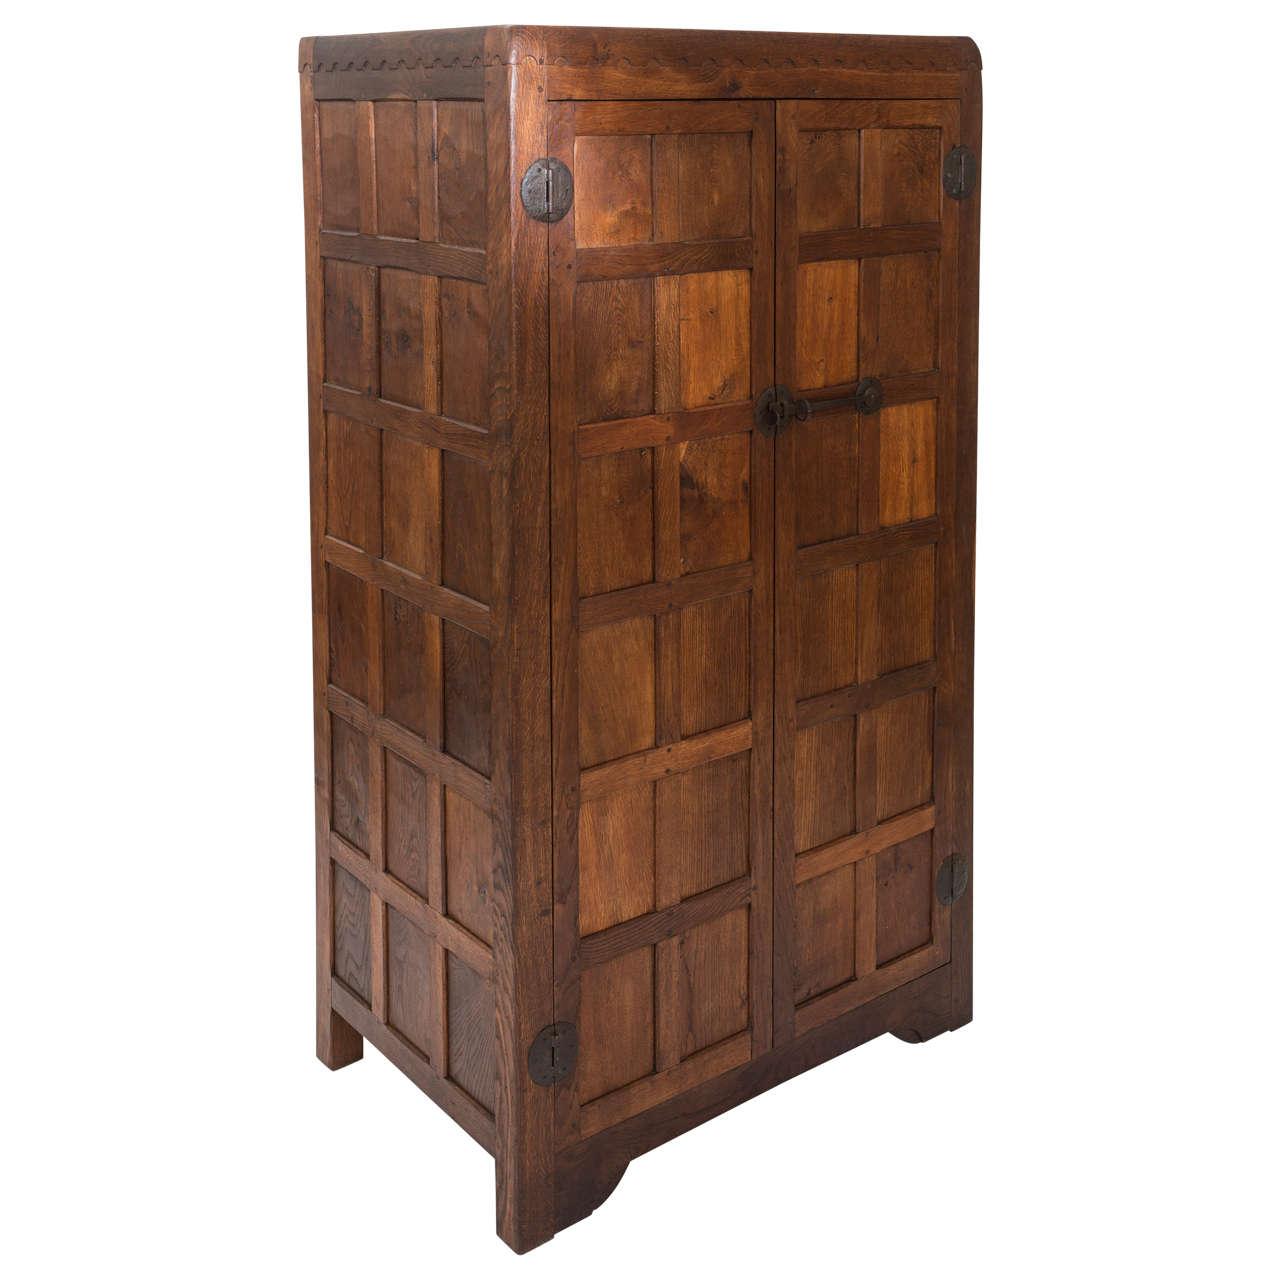 Robert Mouseman Thompson panelled Oak wardrobe England